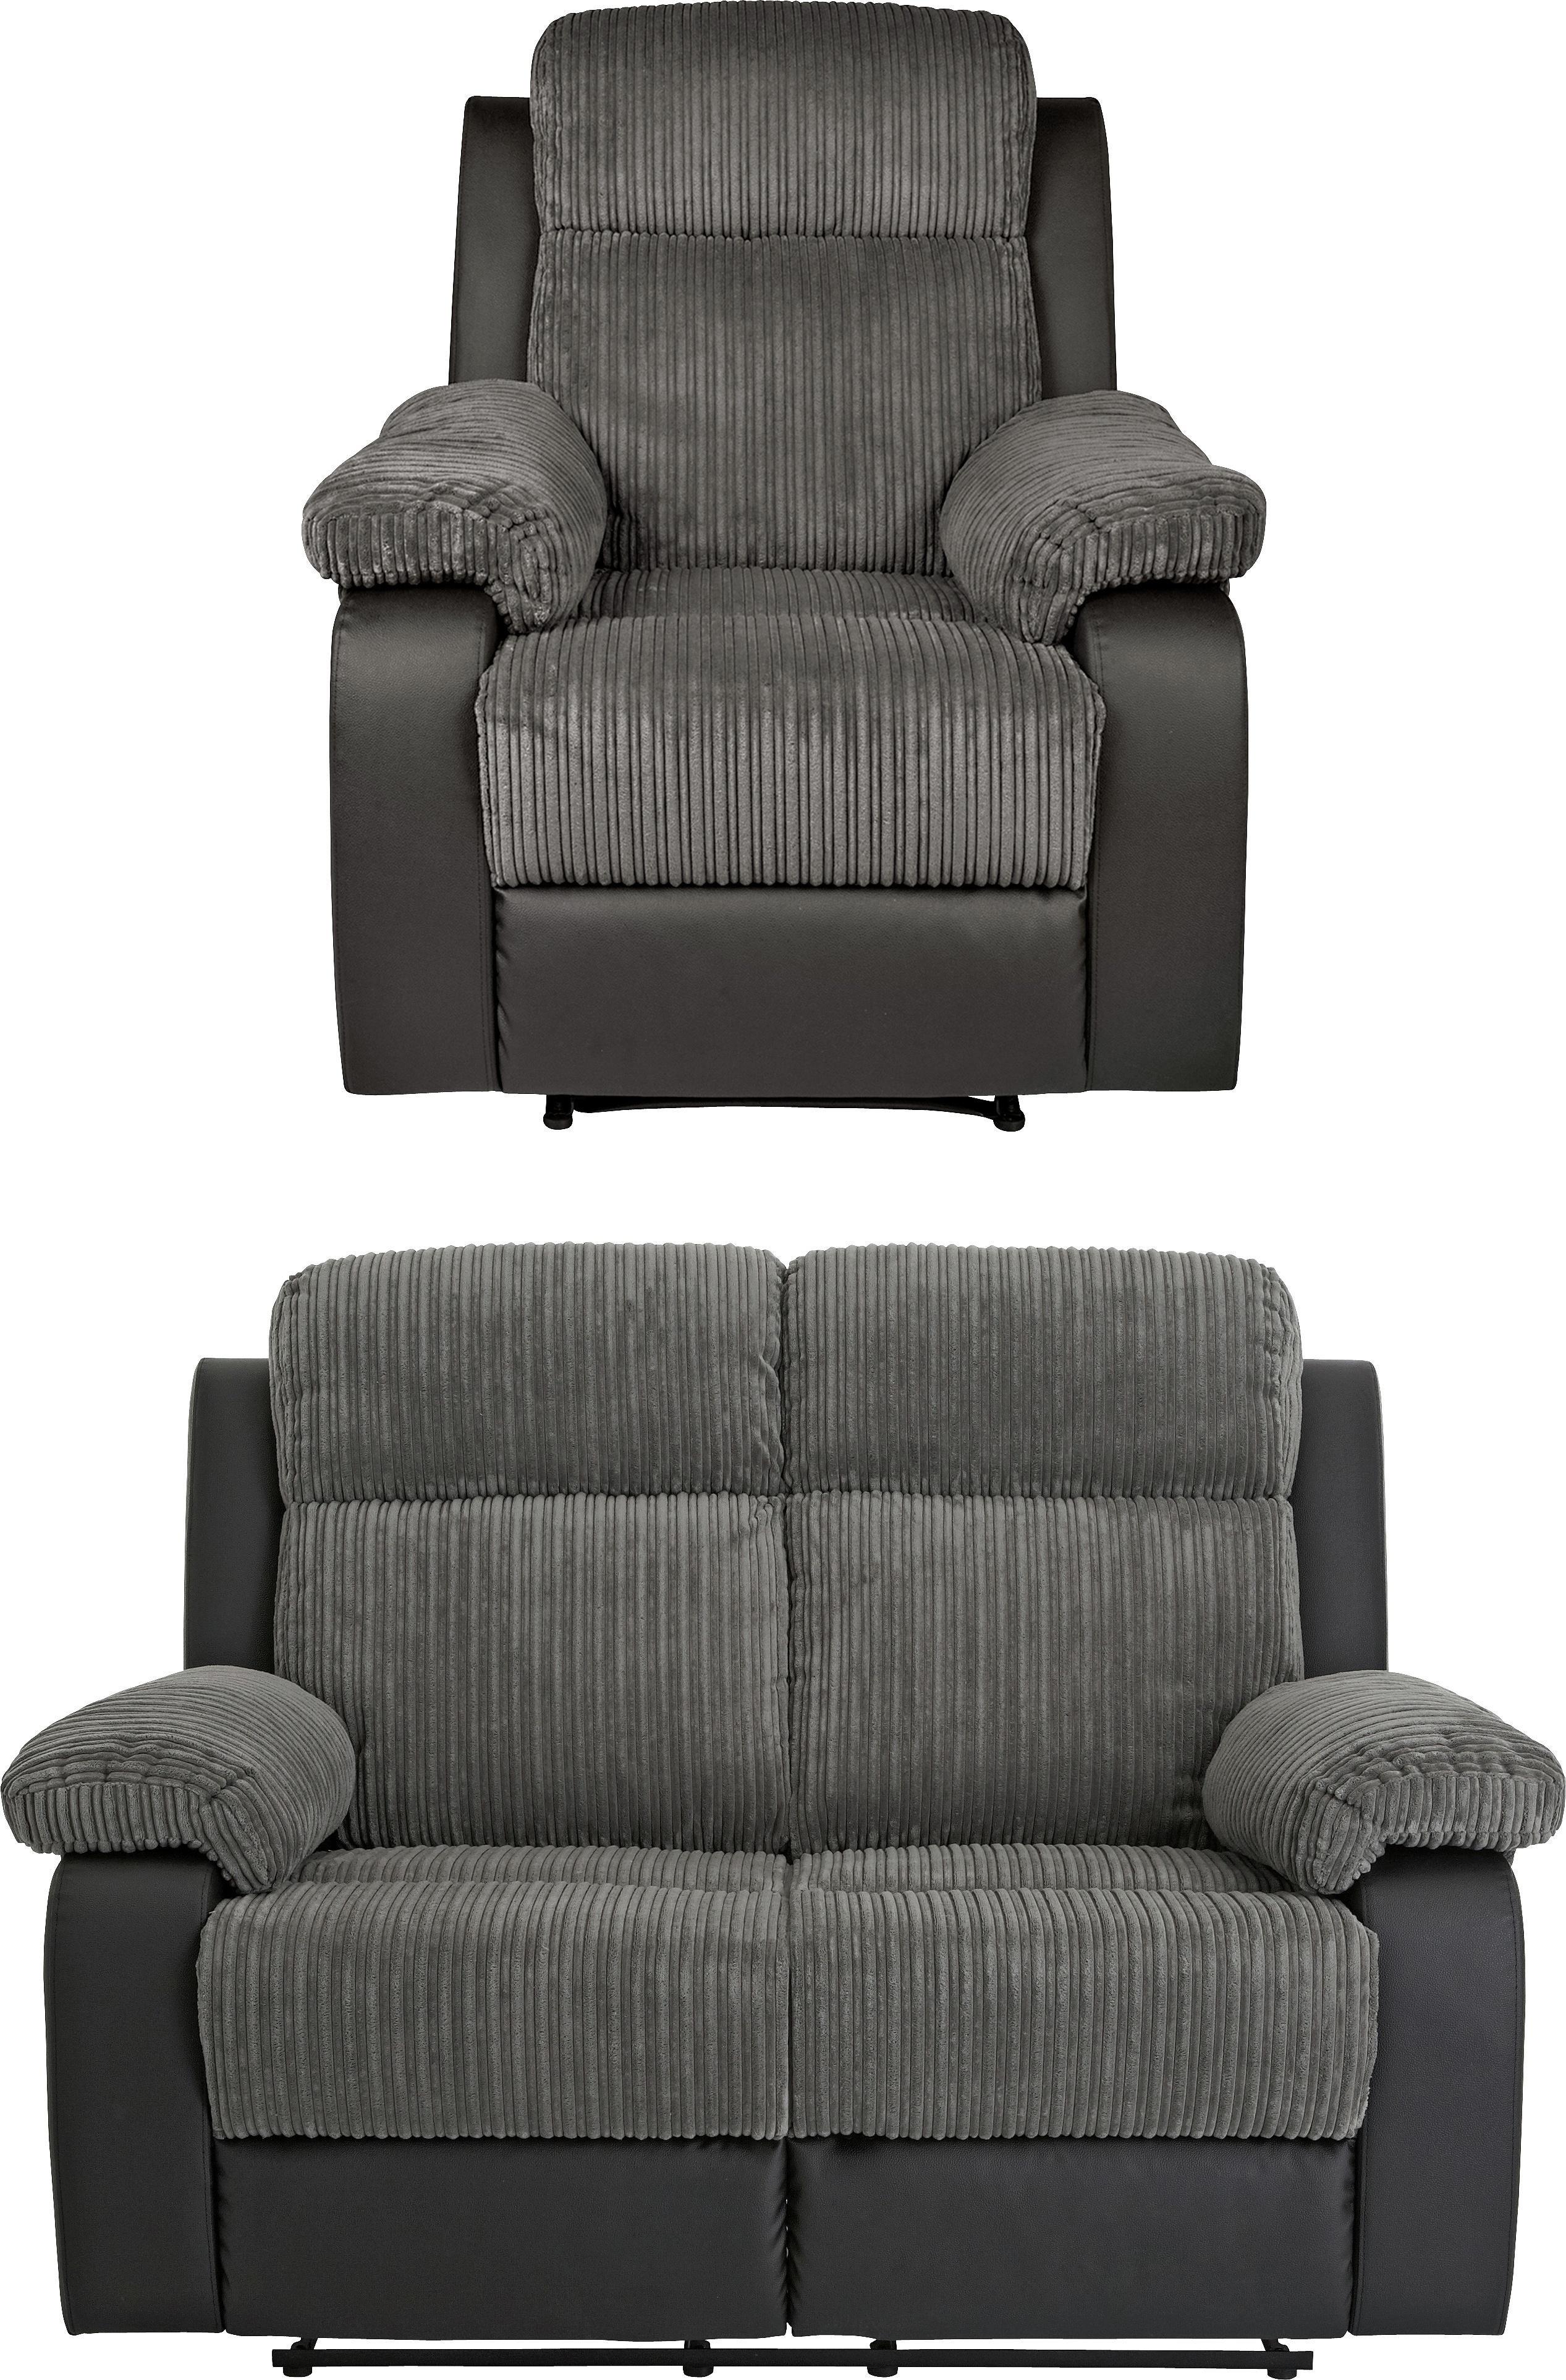 Buy Argos Home Bradley Chair U0026 2 Seater Recliner Sofa   Charcoal | Sofa  Sets | Argos